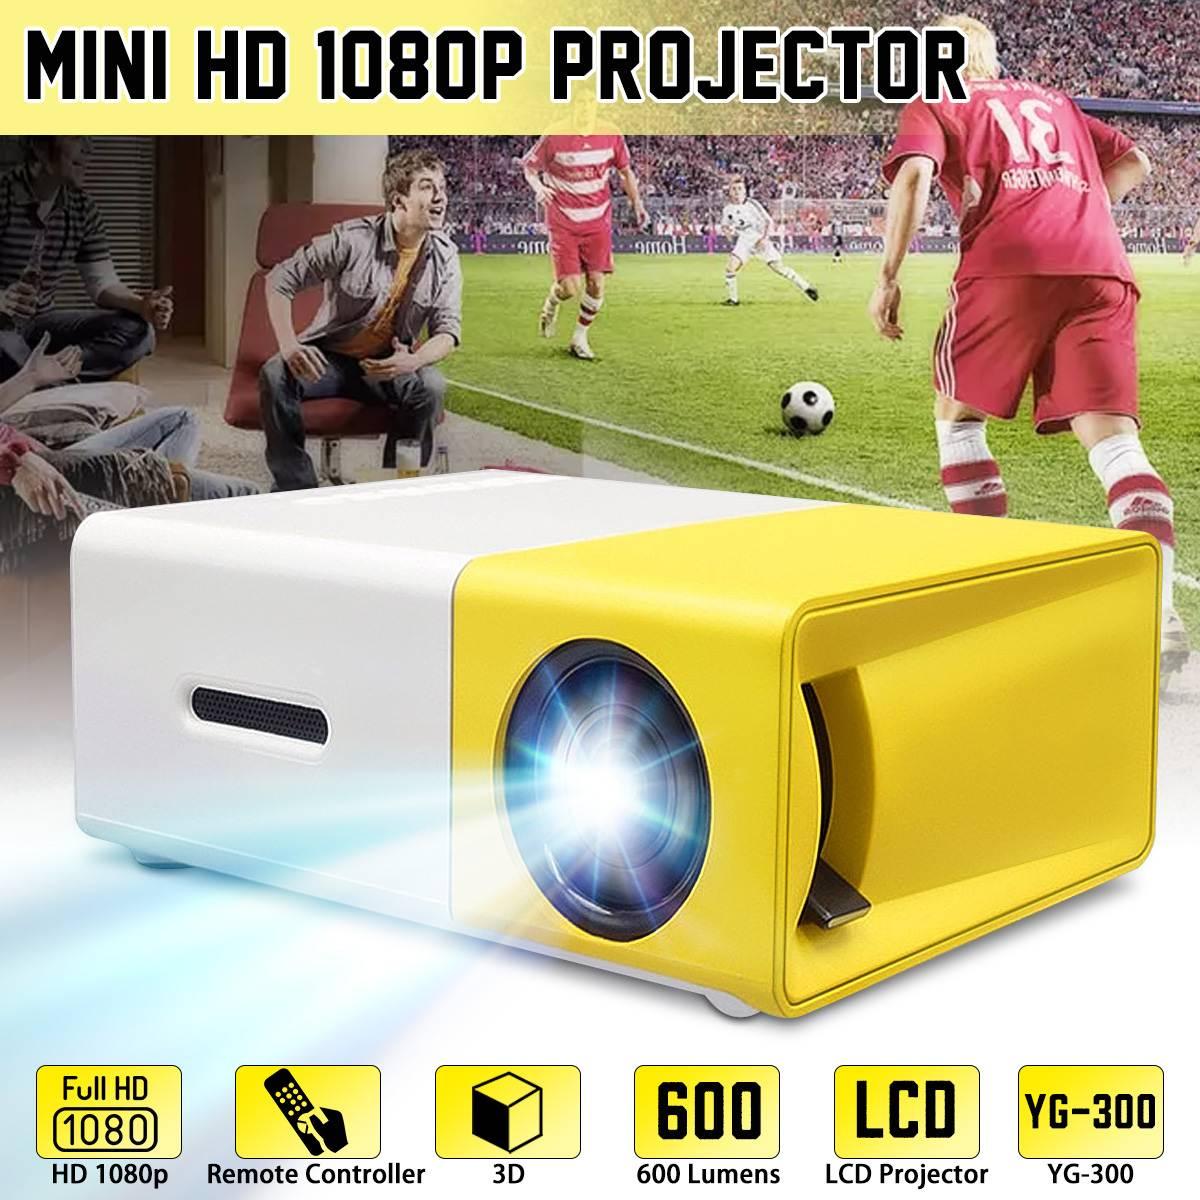 YG-300 LCD Mini Projector LED 400-600 Lumens 320x240 800: 1 apoio 1080P Portátil de Escritório Home Cinema Proyector